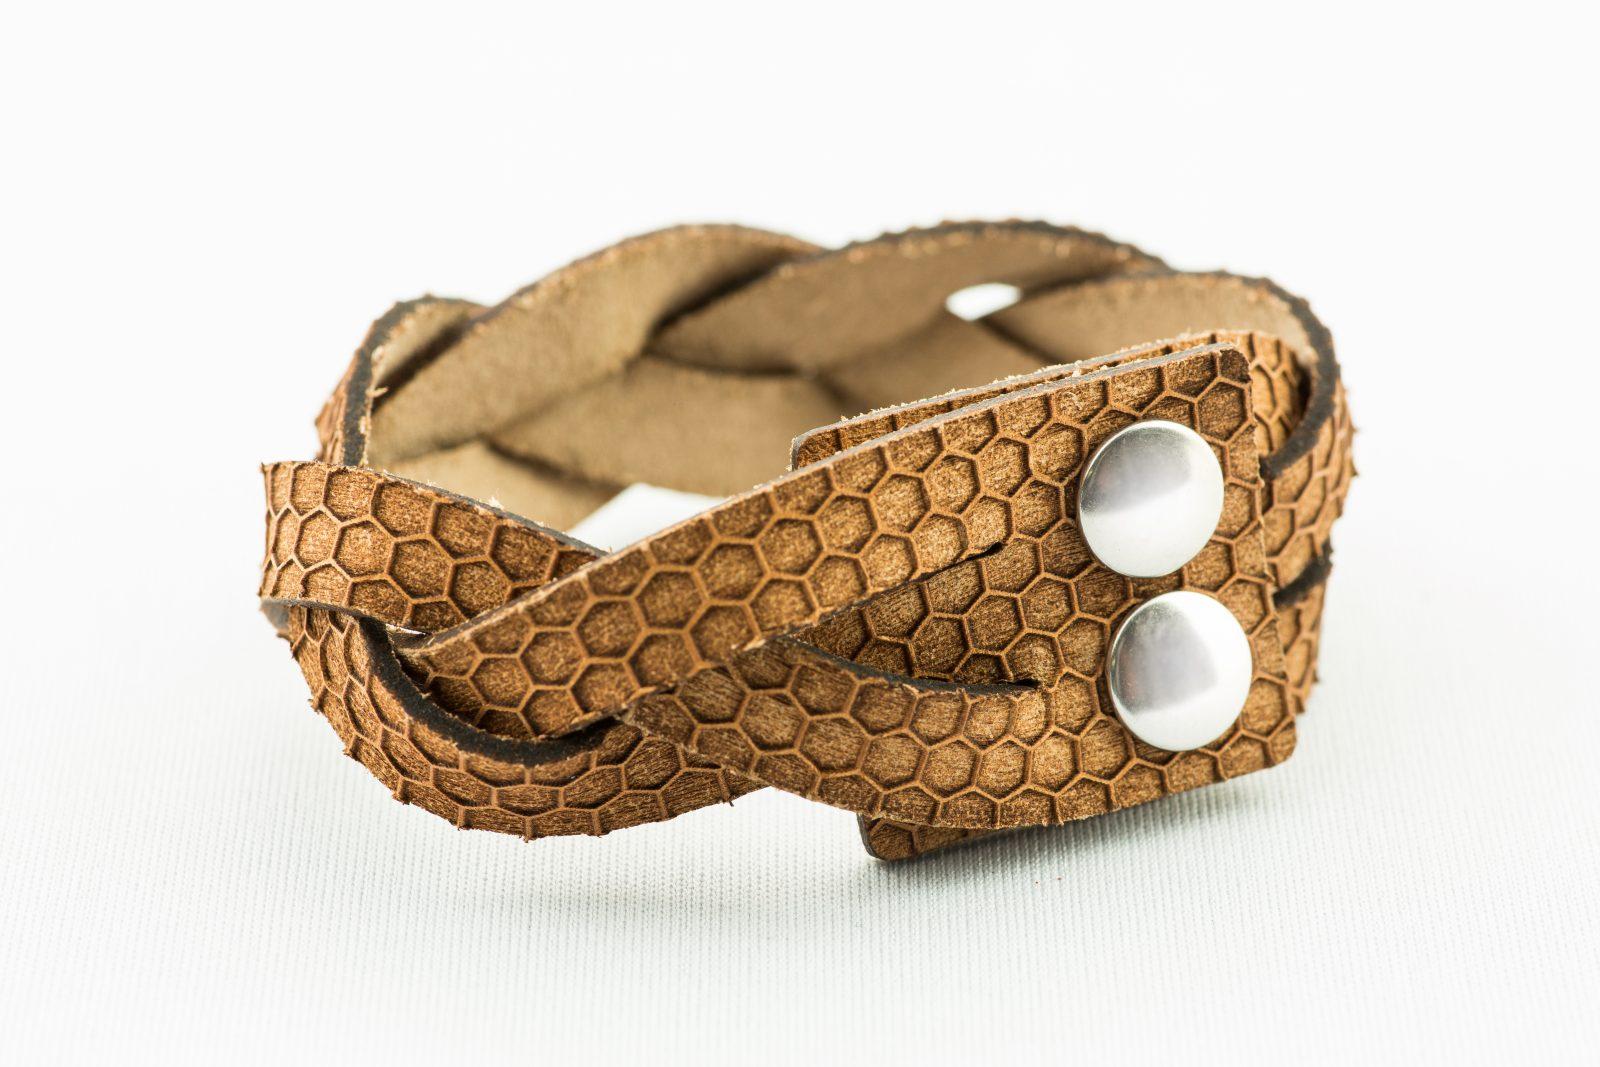 Schmuck Petra Kupfer-Armband braun-9565